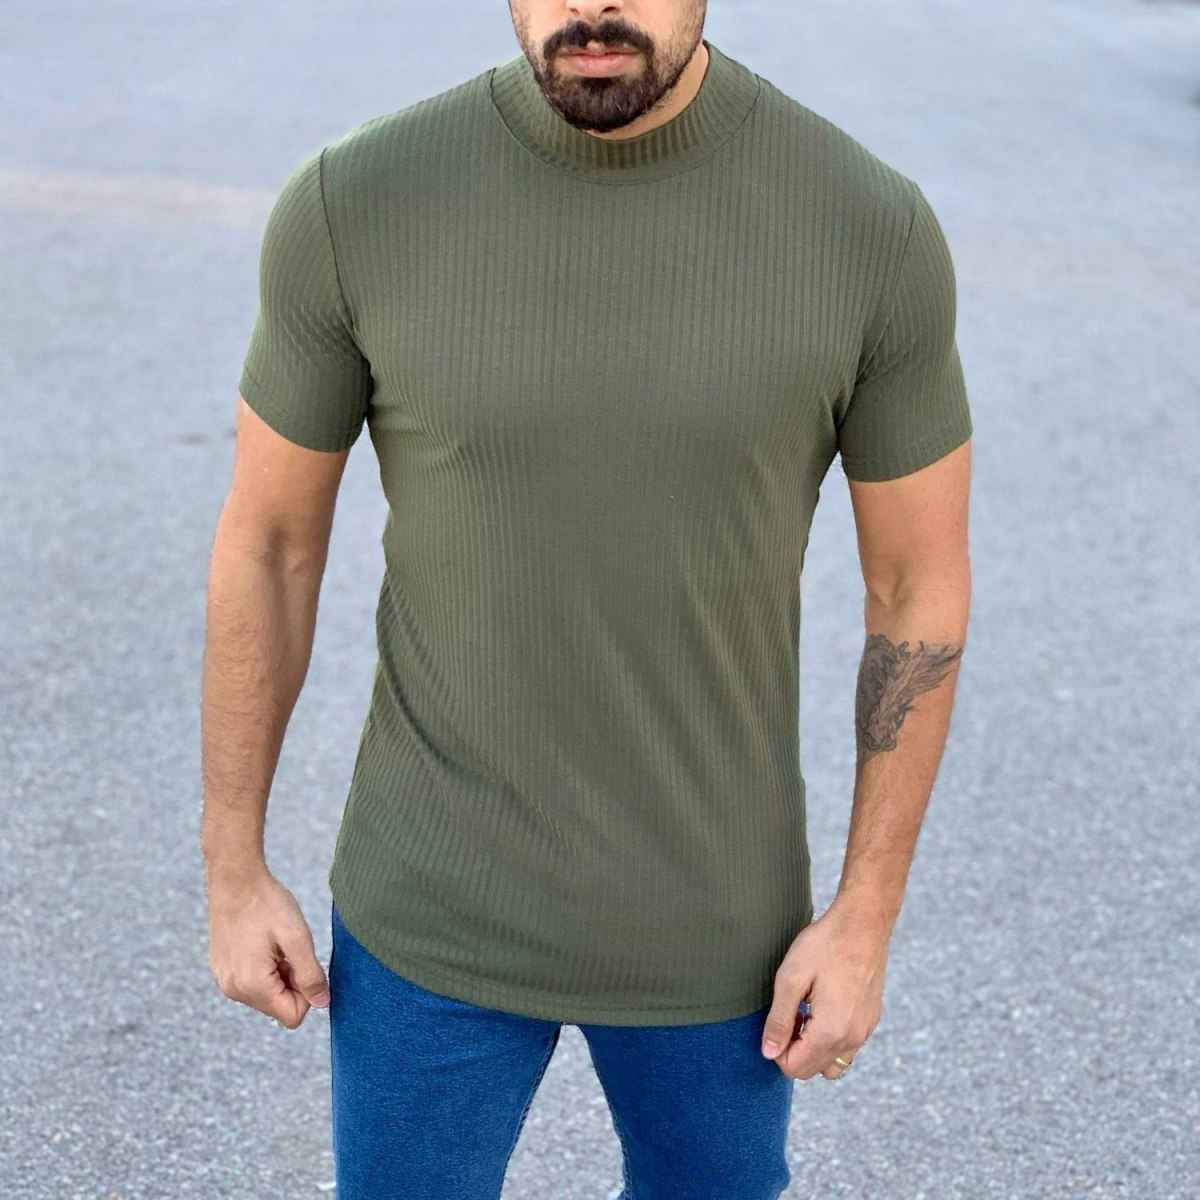 Slim-Fit Lined T-Shirt in Khaki Mv Premium Brand - 1